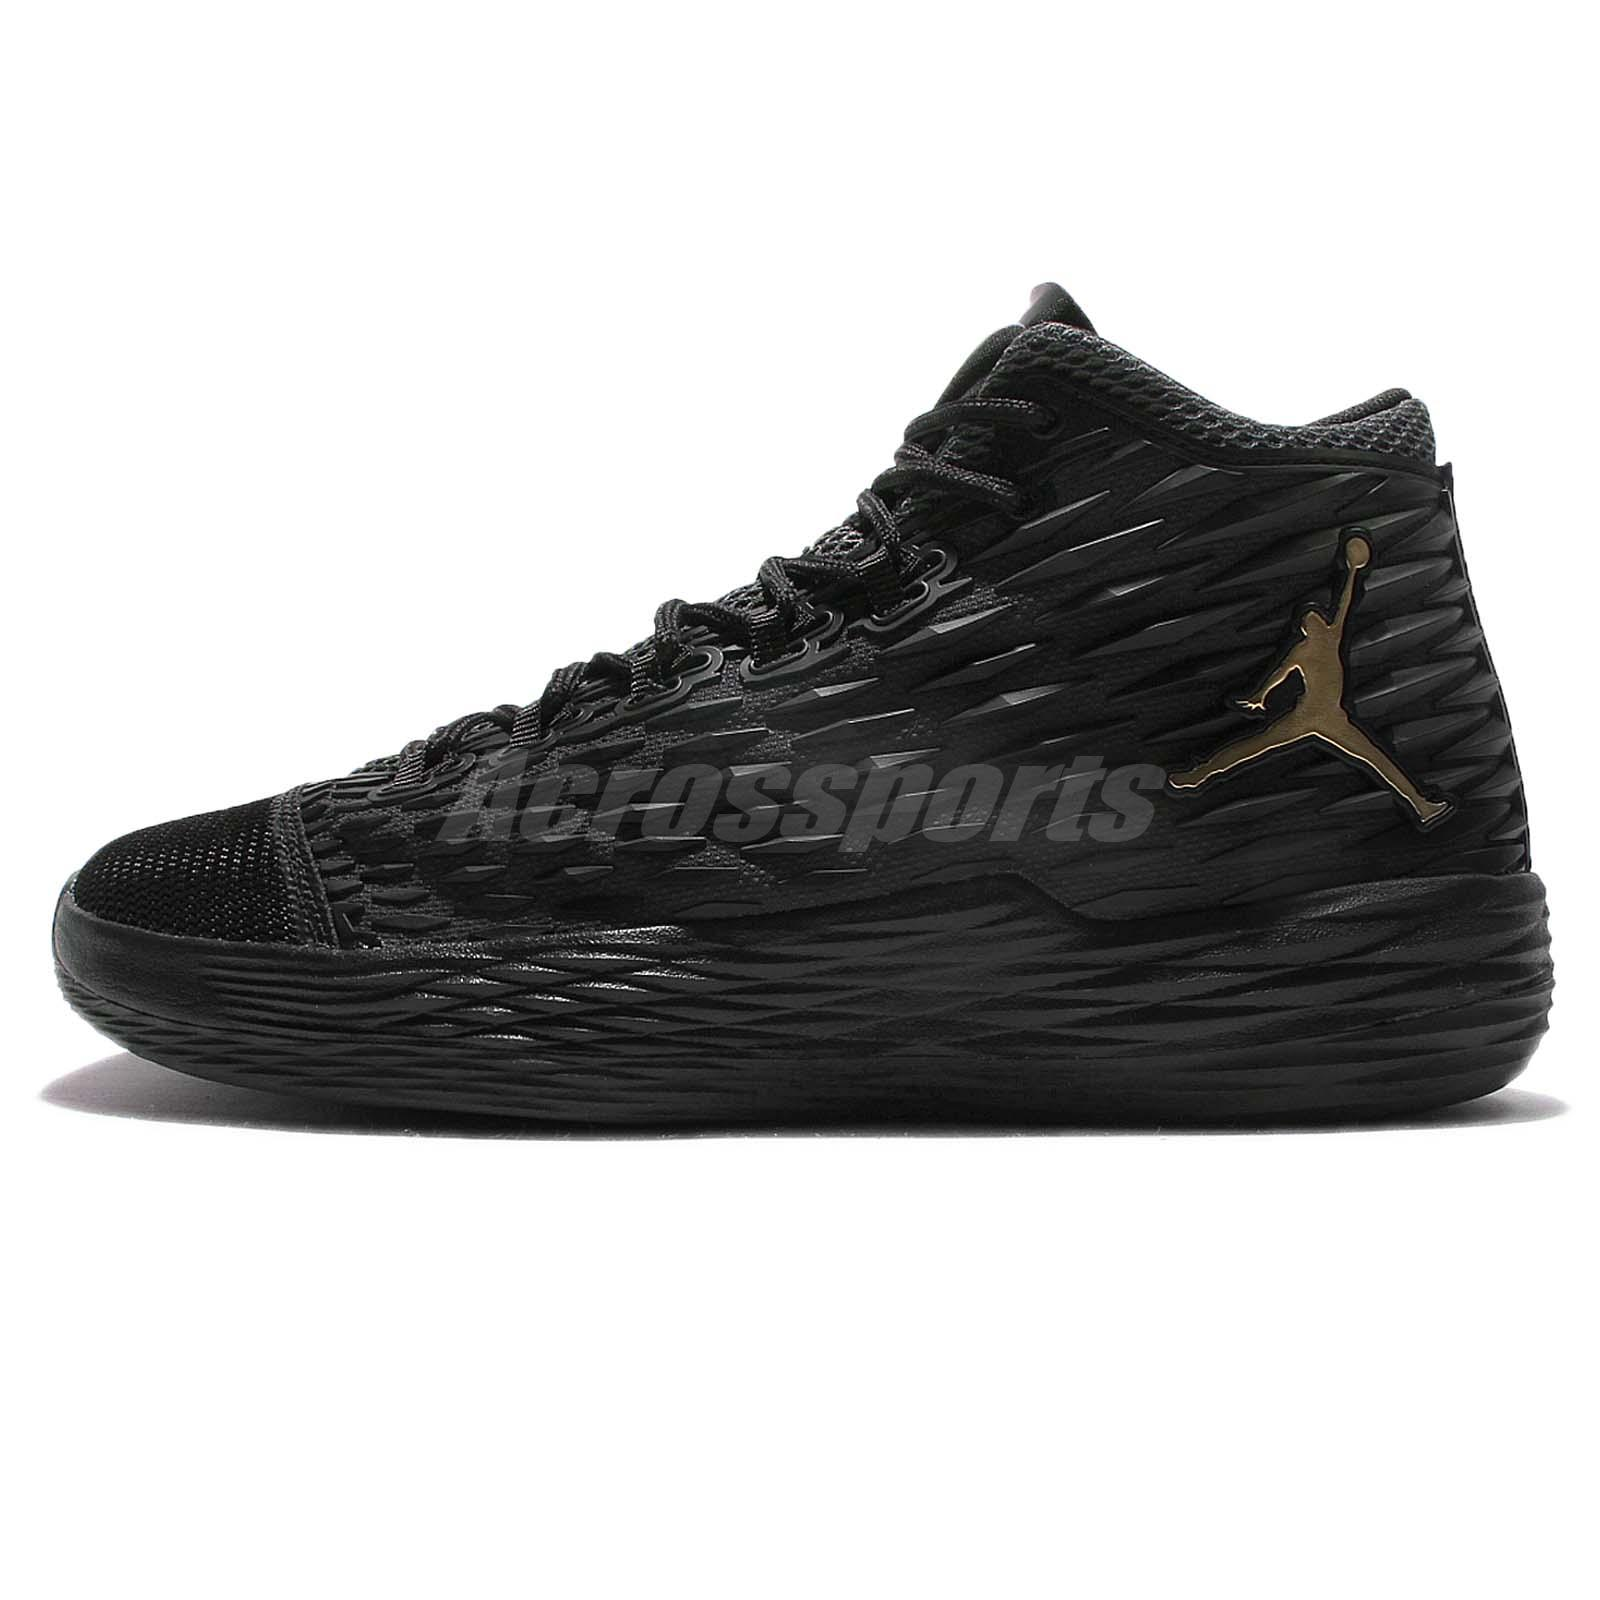 quite nice f6398 f985f ... Nike Jordan Melo M13 X Carmelo Anthony XIII Black Gold Men Basketball  902443-002 ...